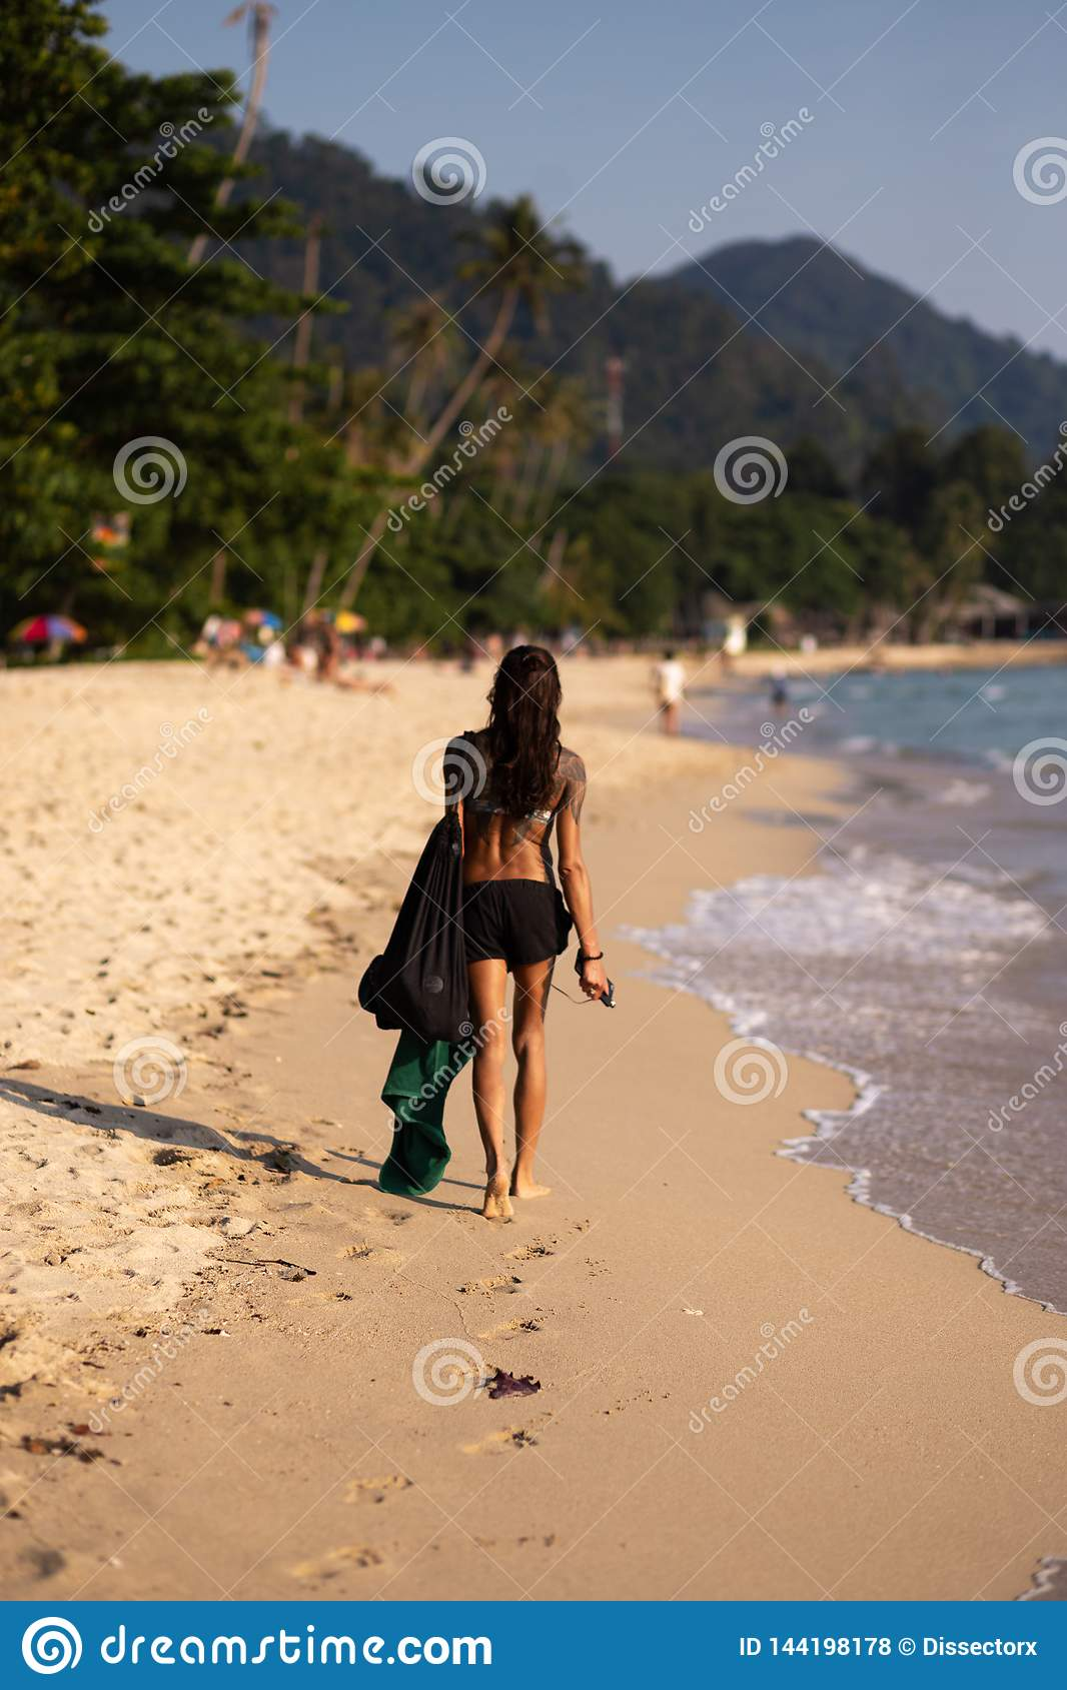 KO CHANG, ΤΑΪΛΆΝΔΗ - 9 ΑΠΡΙΛΊΟΥ 2018: Γνήσιος ασιατικά αυτοί κορίτσι που περπατά κατά μήκος της θάλασσας σε μια παραλία με την κα